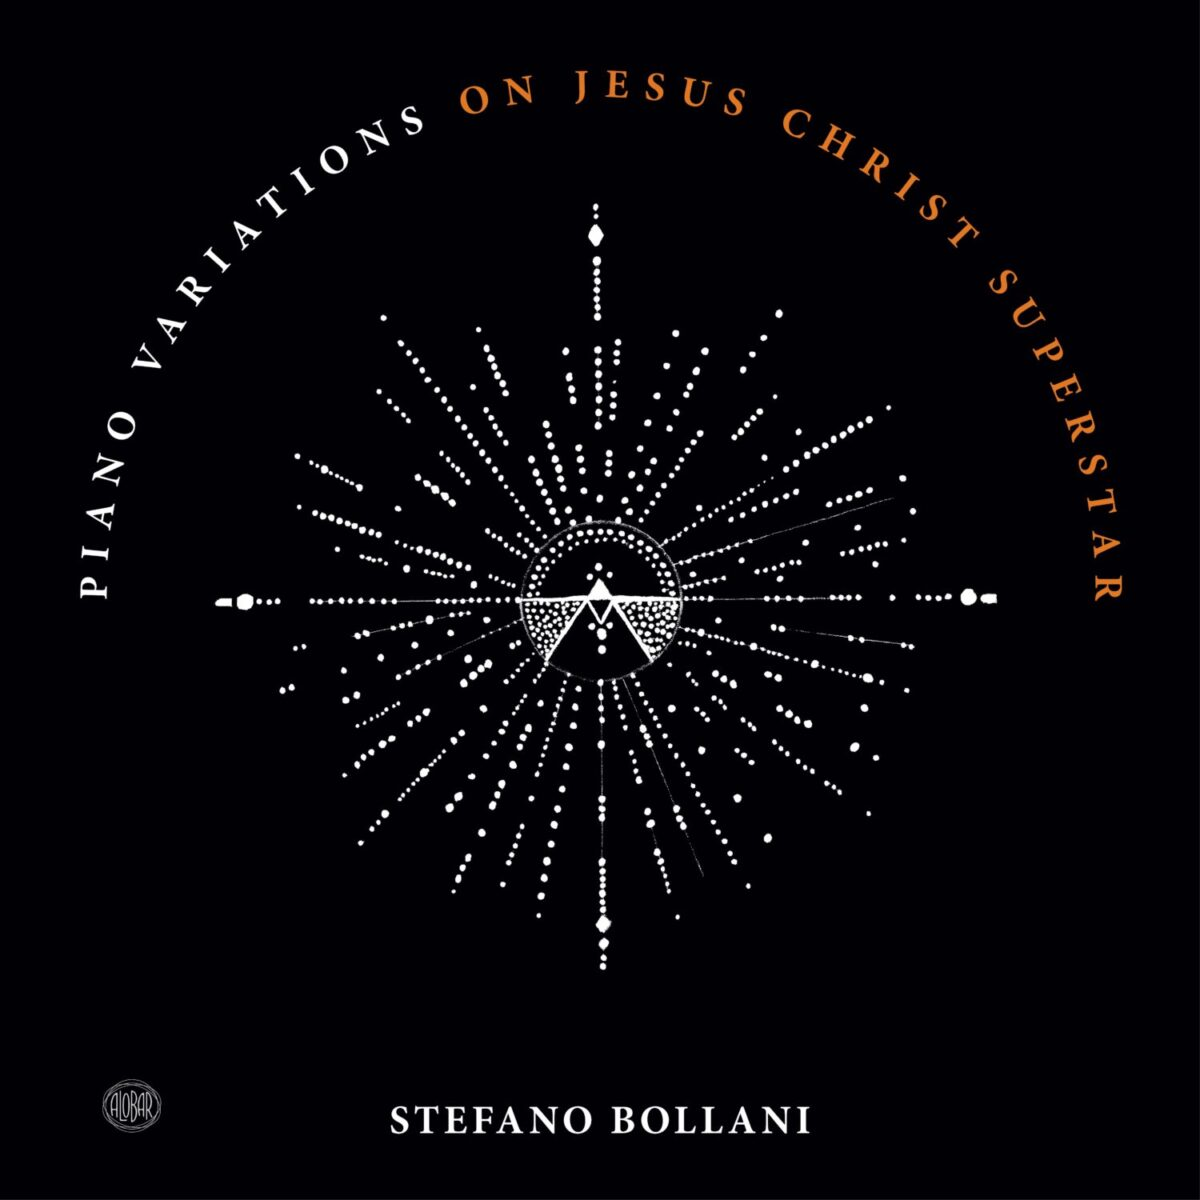 Stefano Bollani Jesus Christ Super Star